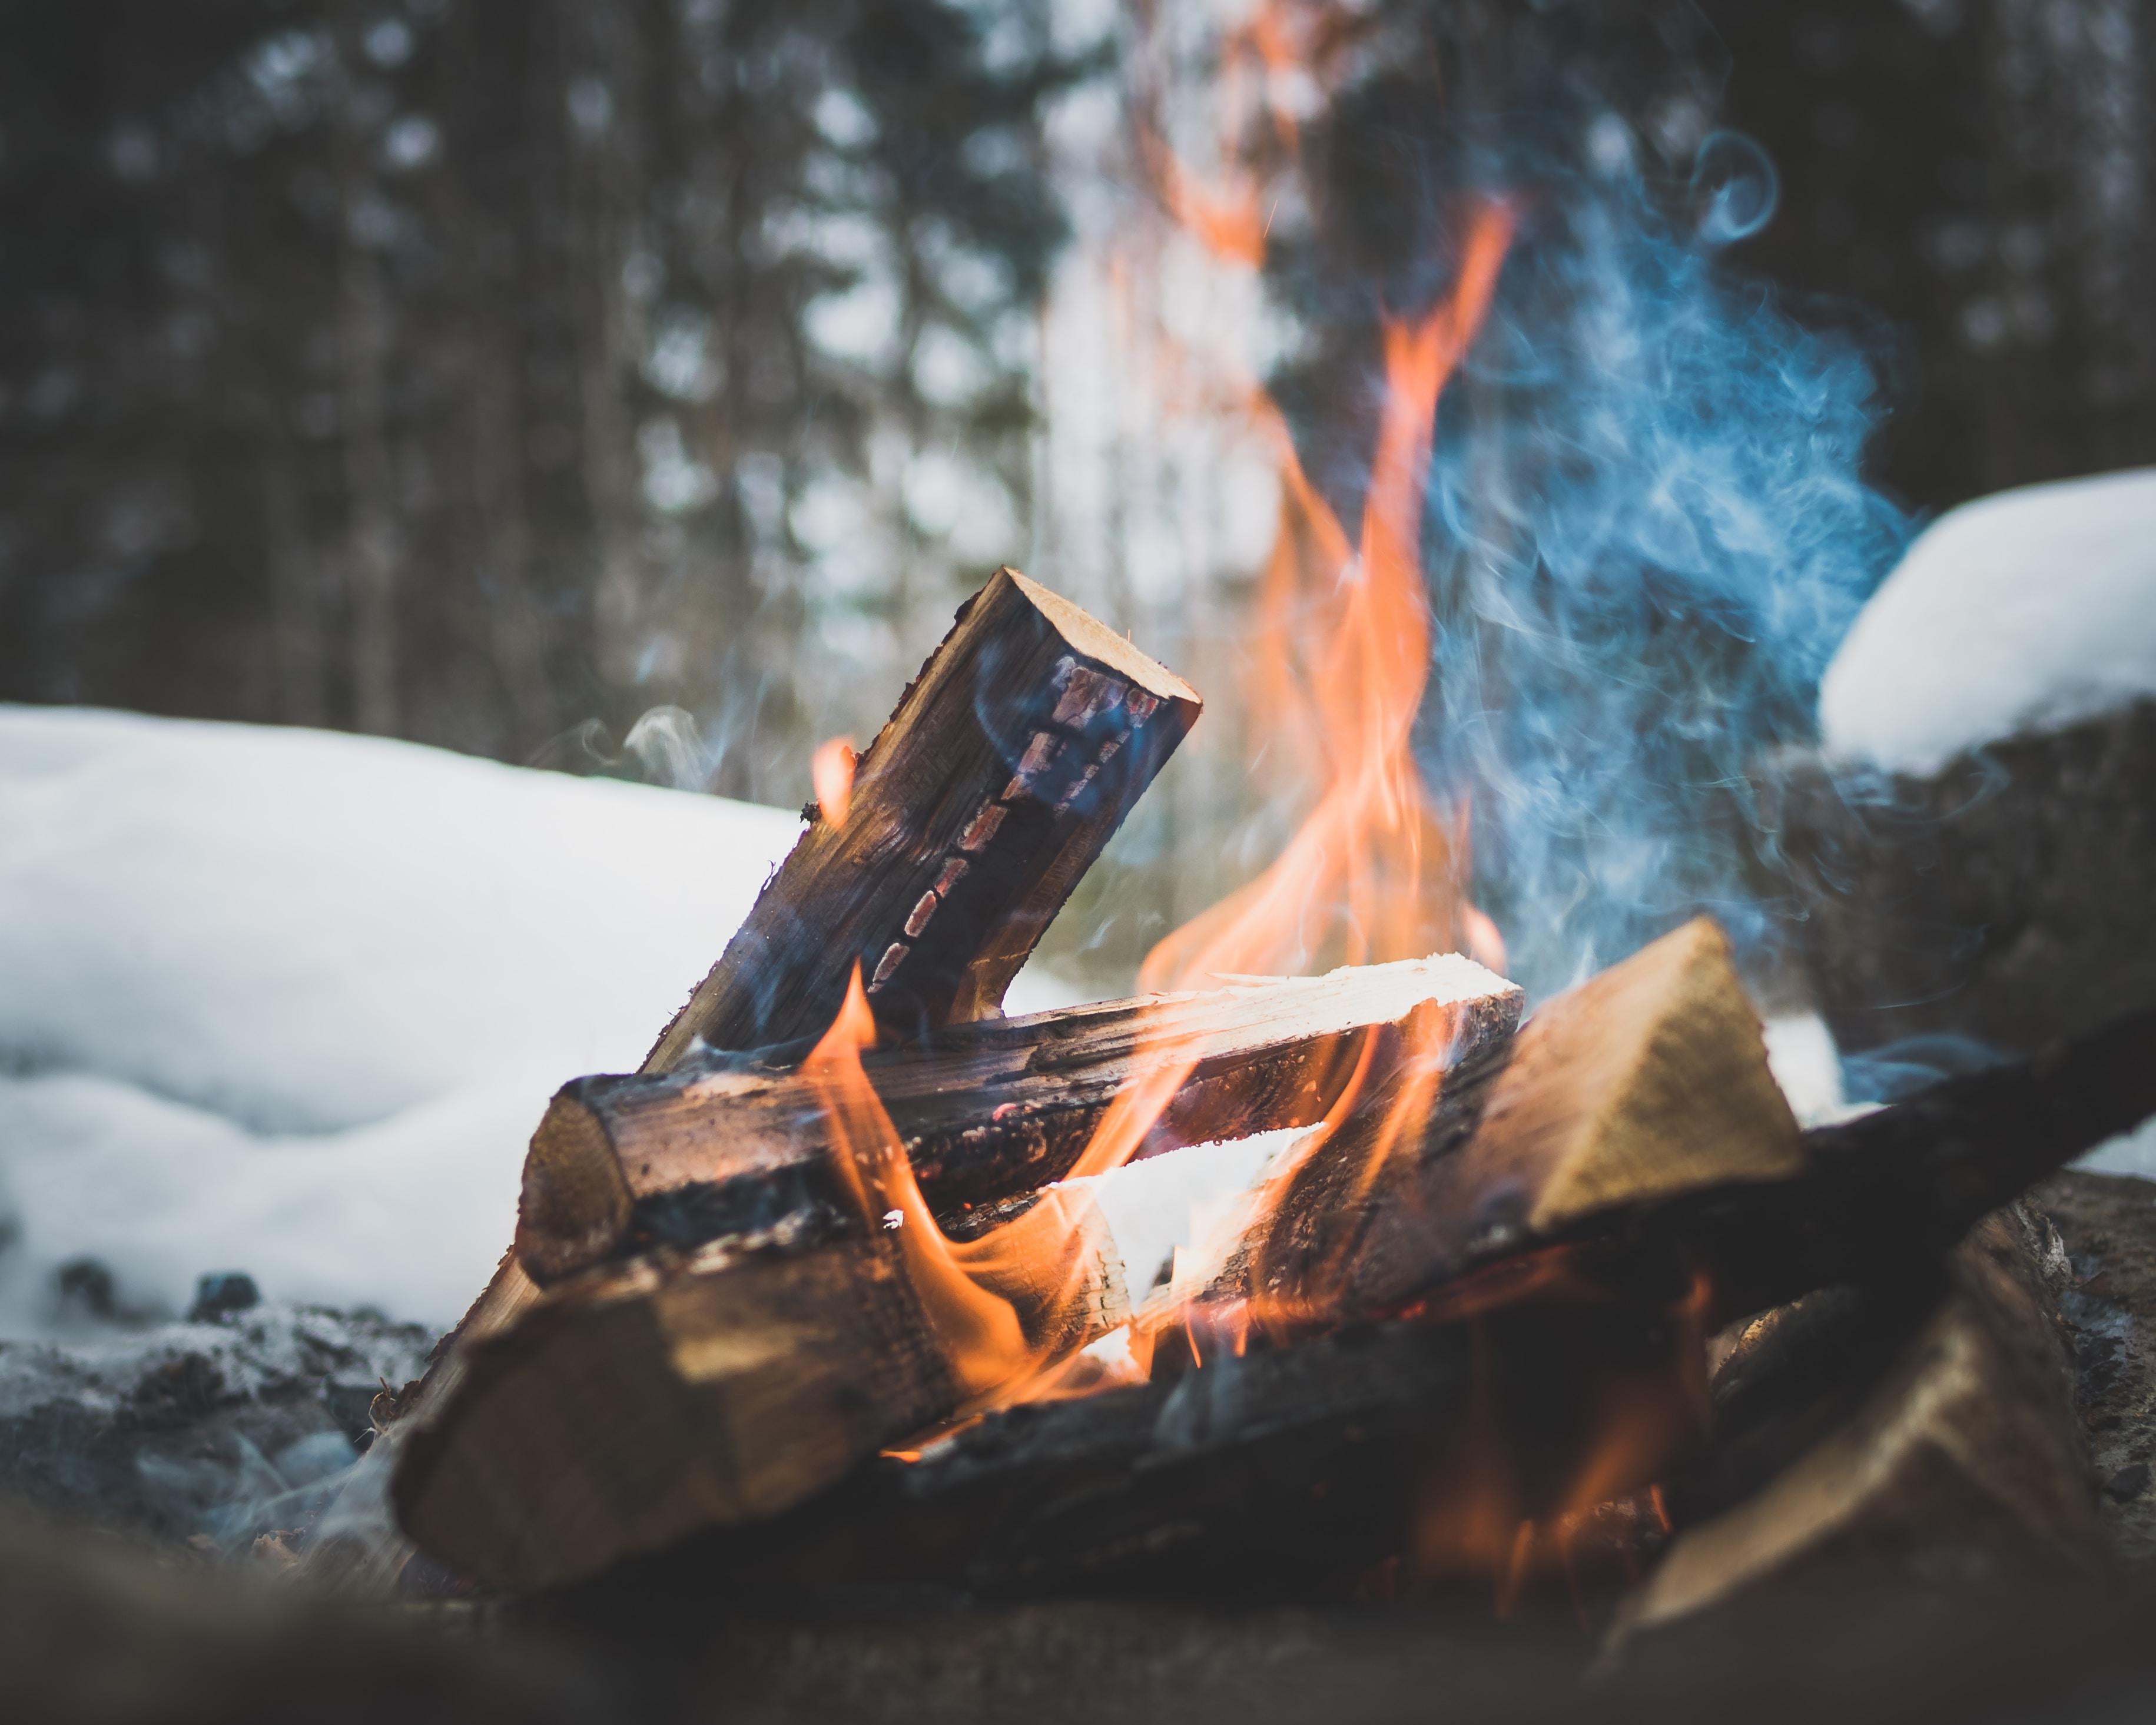 firewood on flame